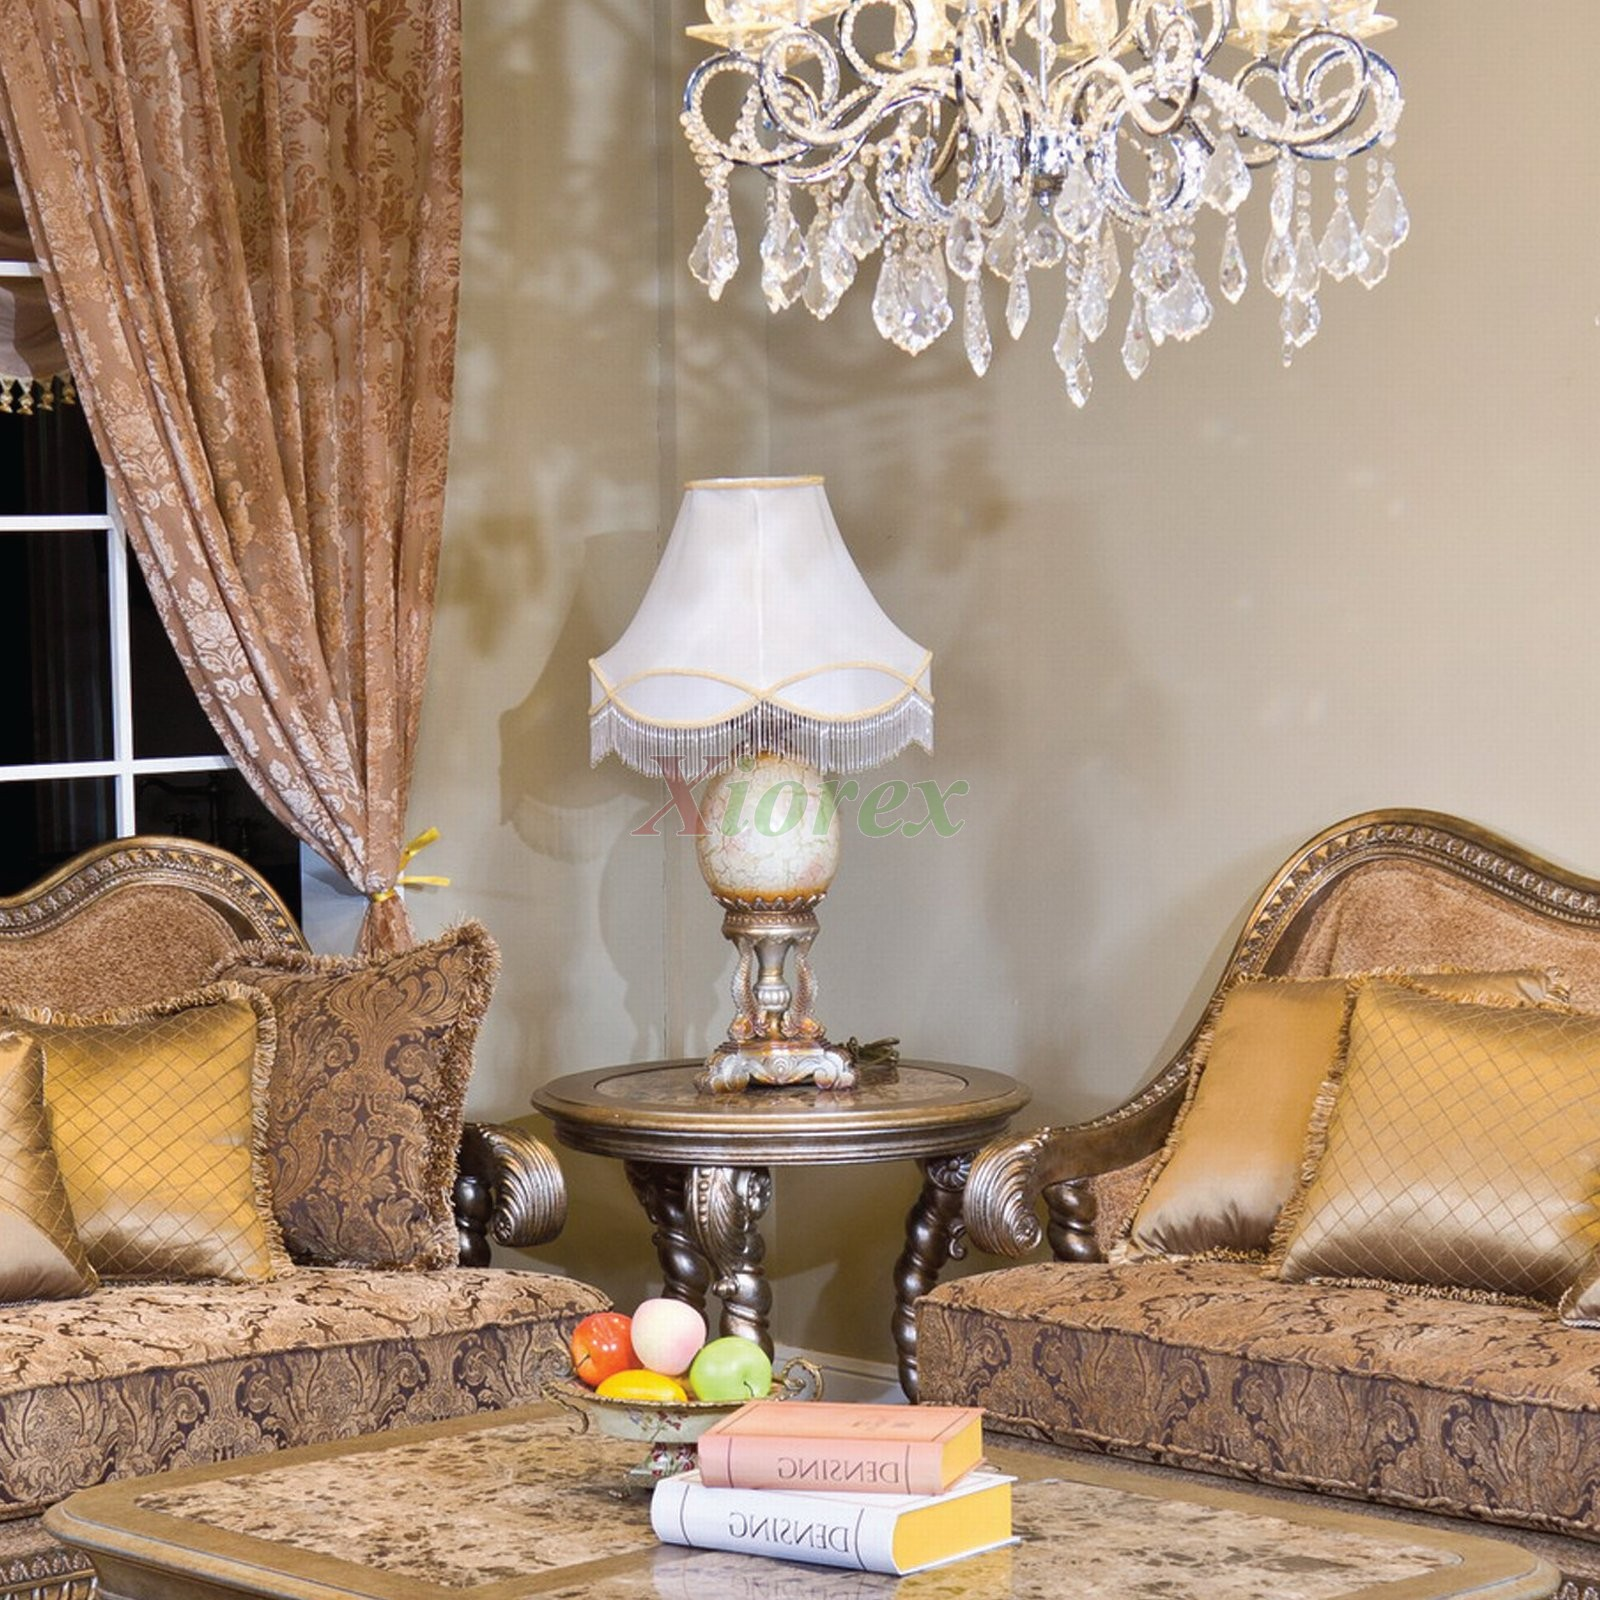 Living Room Table Toronto: Alya Rectangle Coffee Table Set Toronto For Living Room